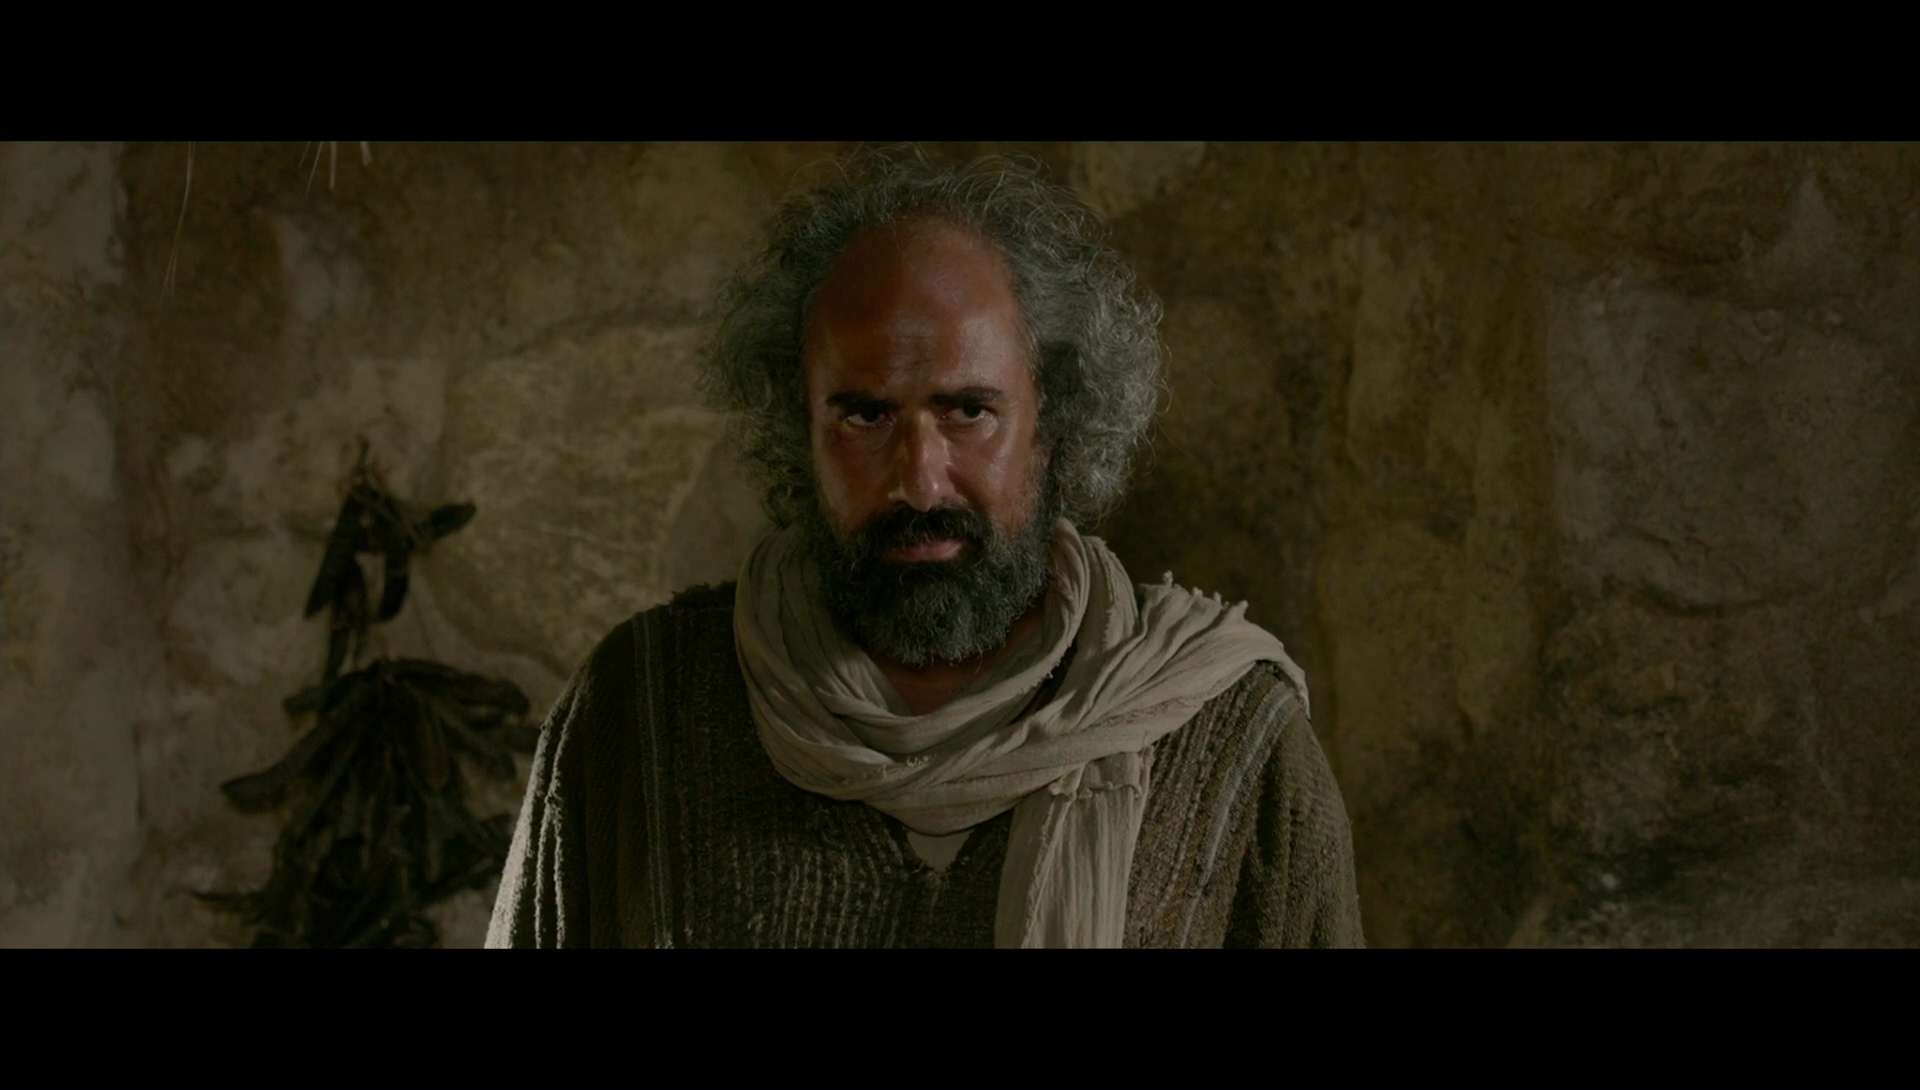 La Resurreccion De Cristo 1080p Lat-Cast-Ing 5.1 (2016)